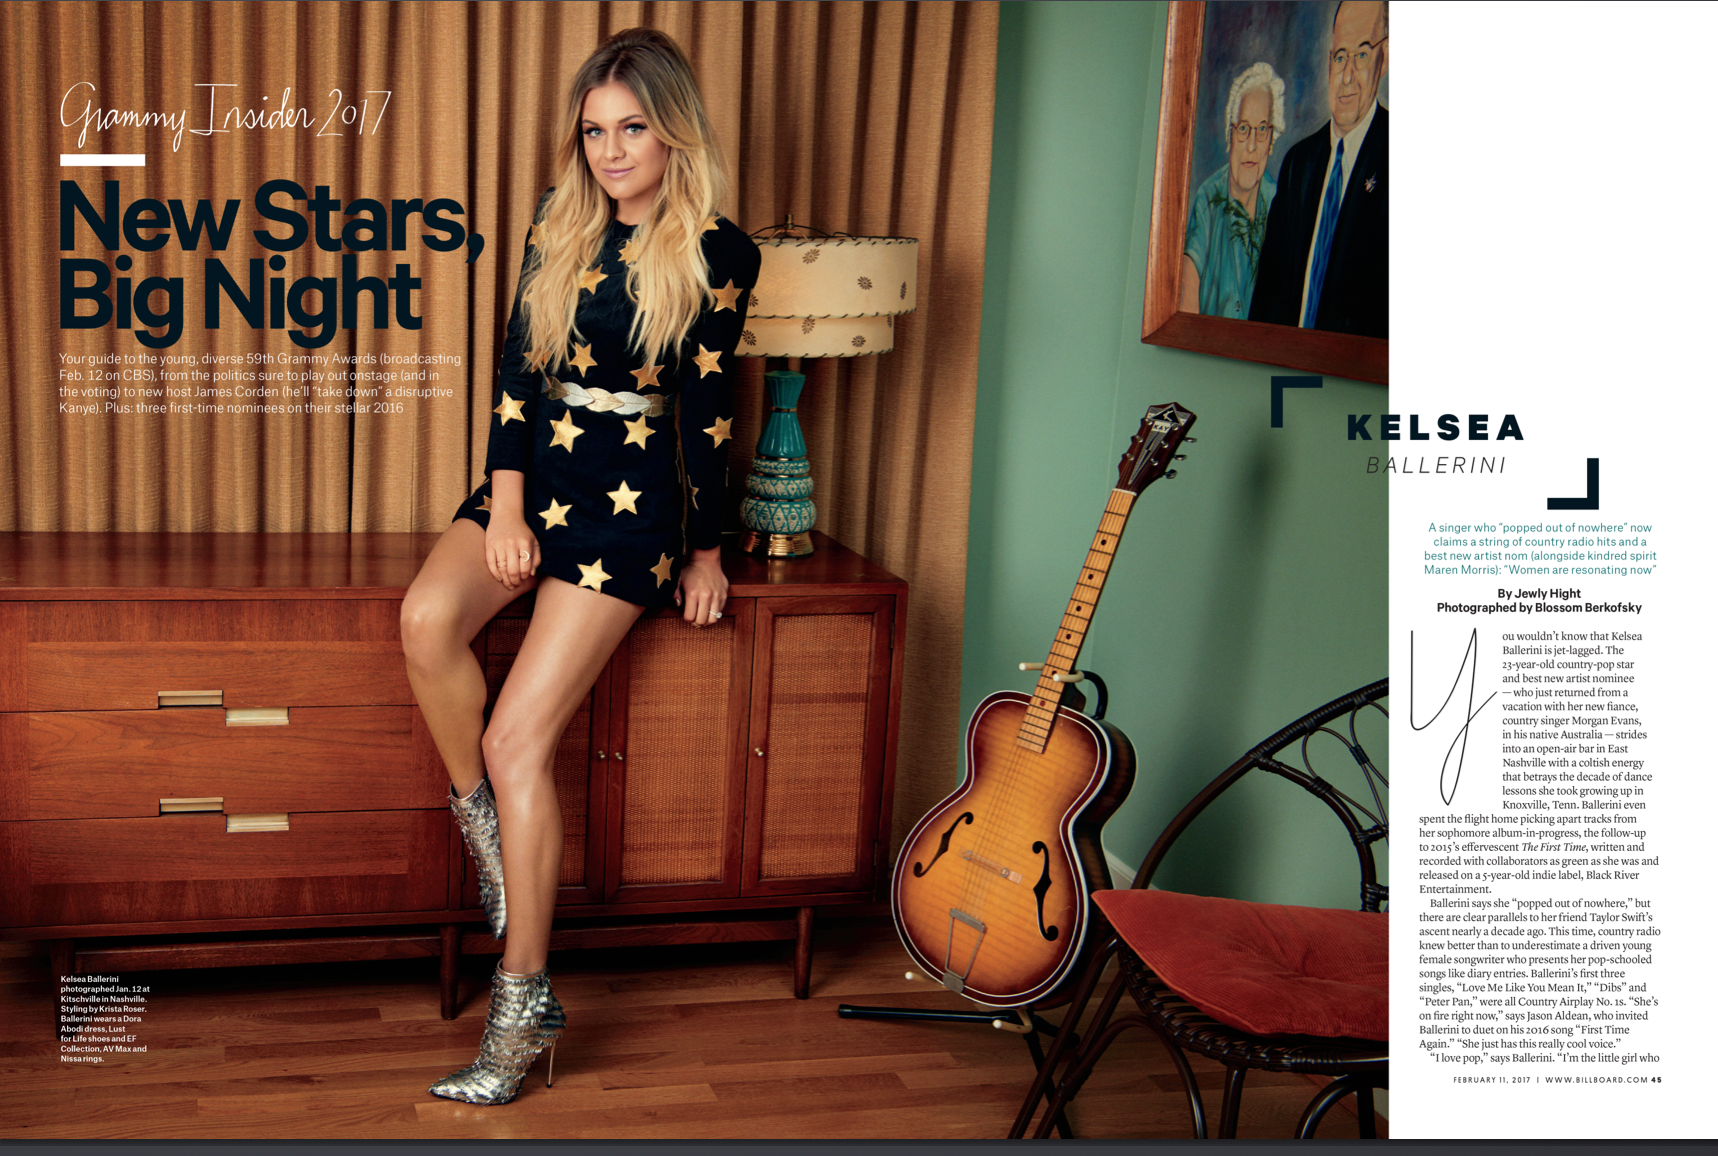 Kelsea Ballerini, Billboard Cover Shoot, Feb. 2017